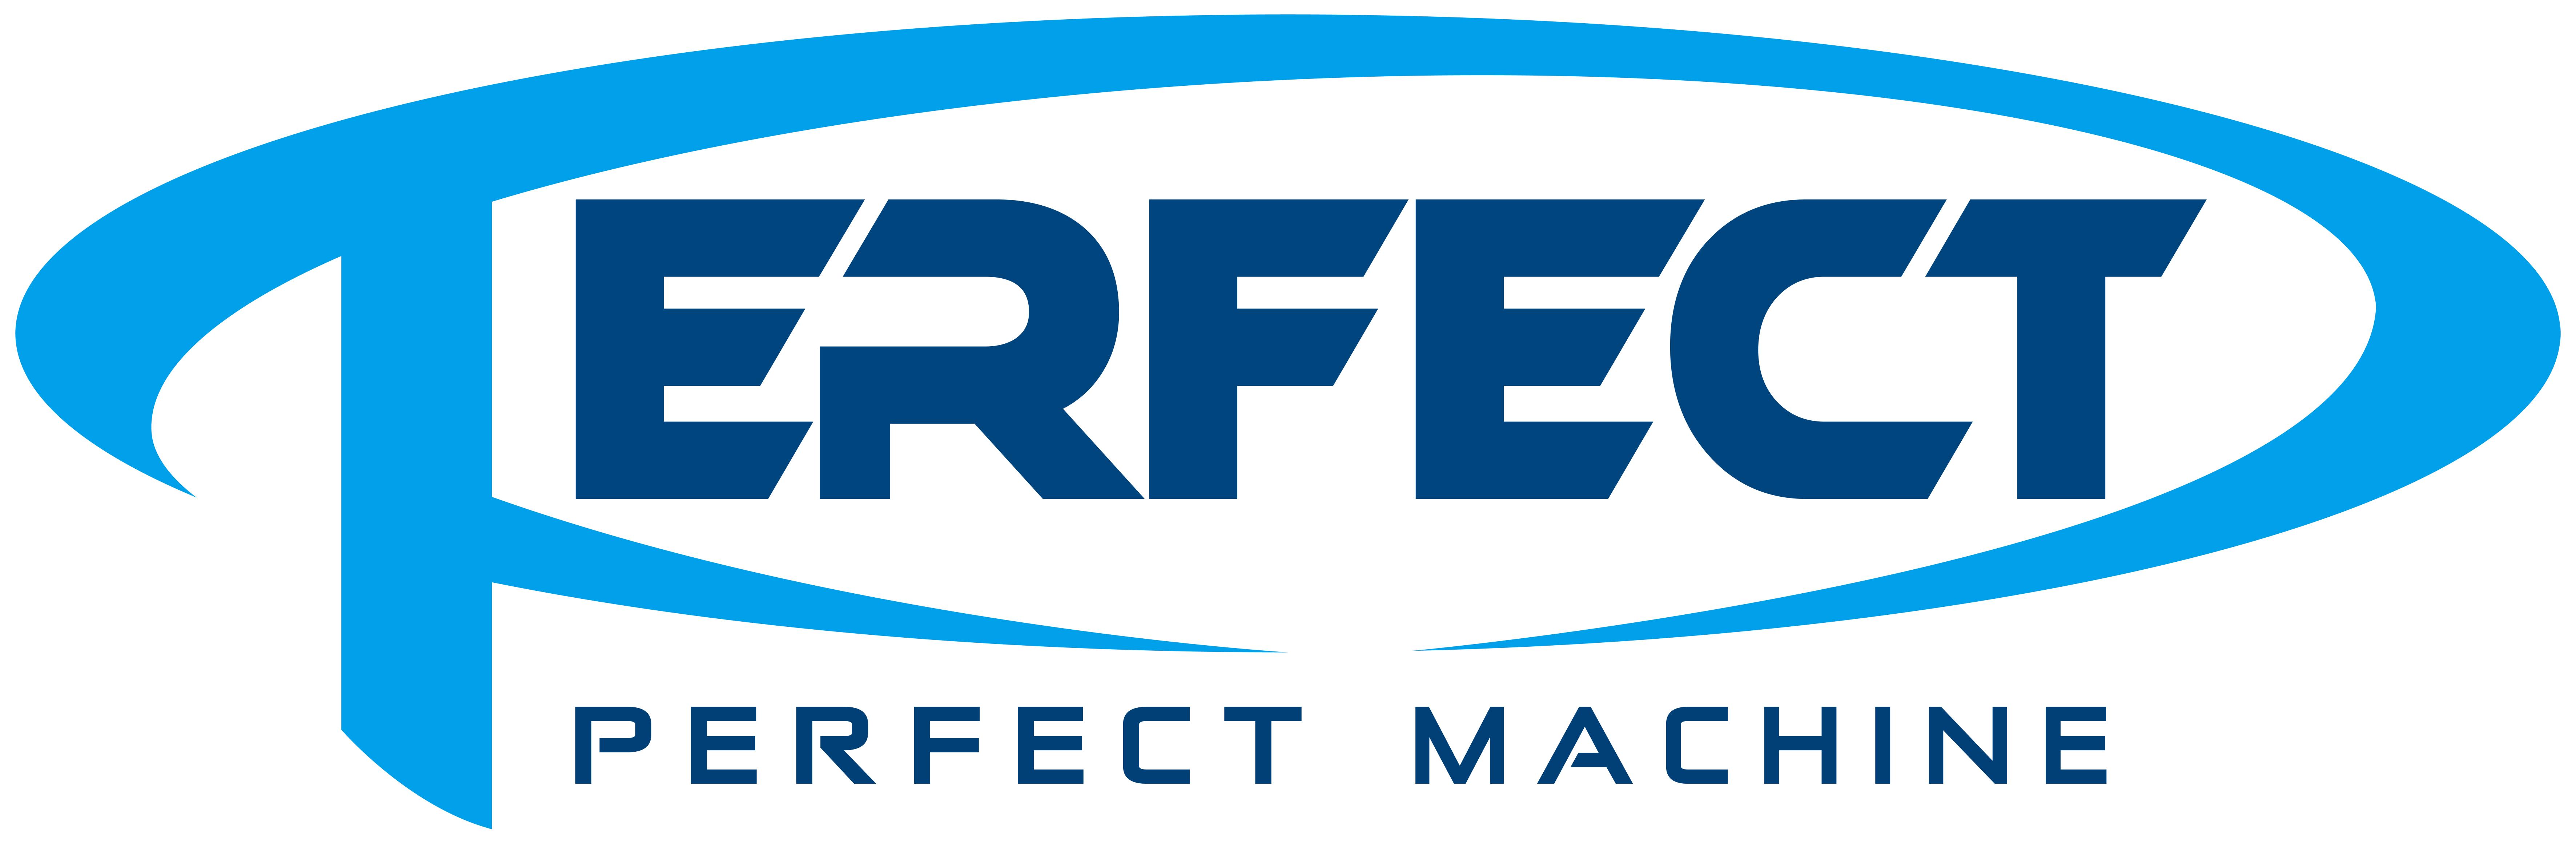 PERFECT MACHINE CO., LTD.